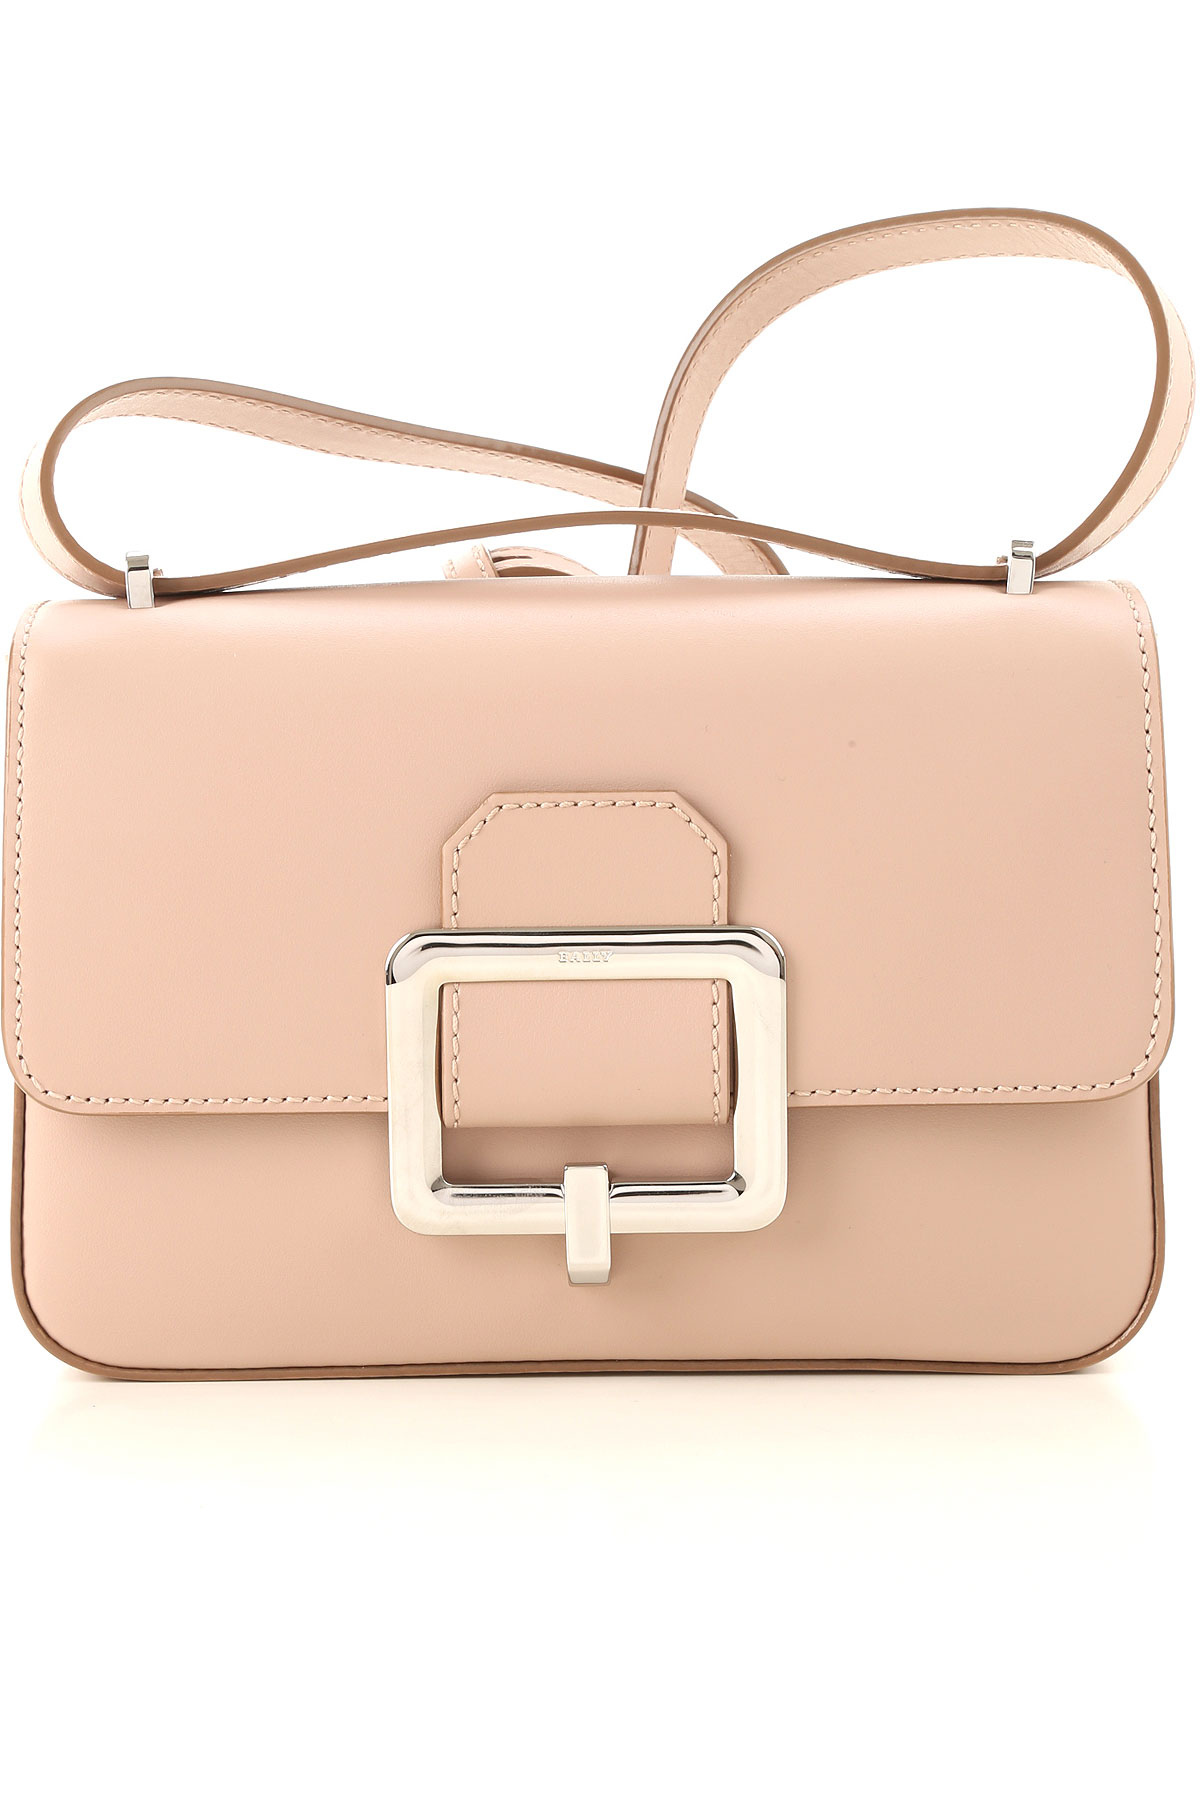 Bally Shoulder Bag for Women On Sale, skin, Leather, 2019